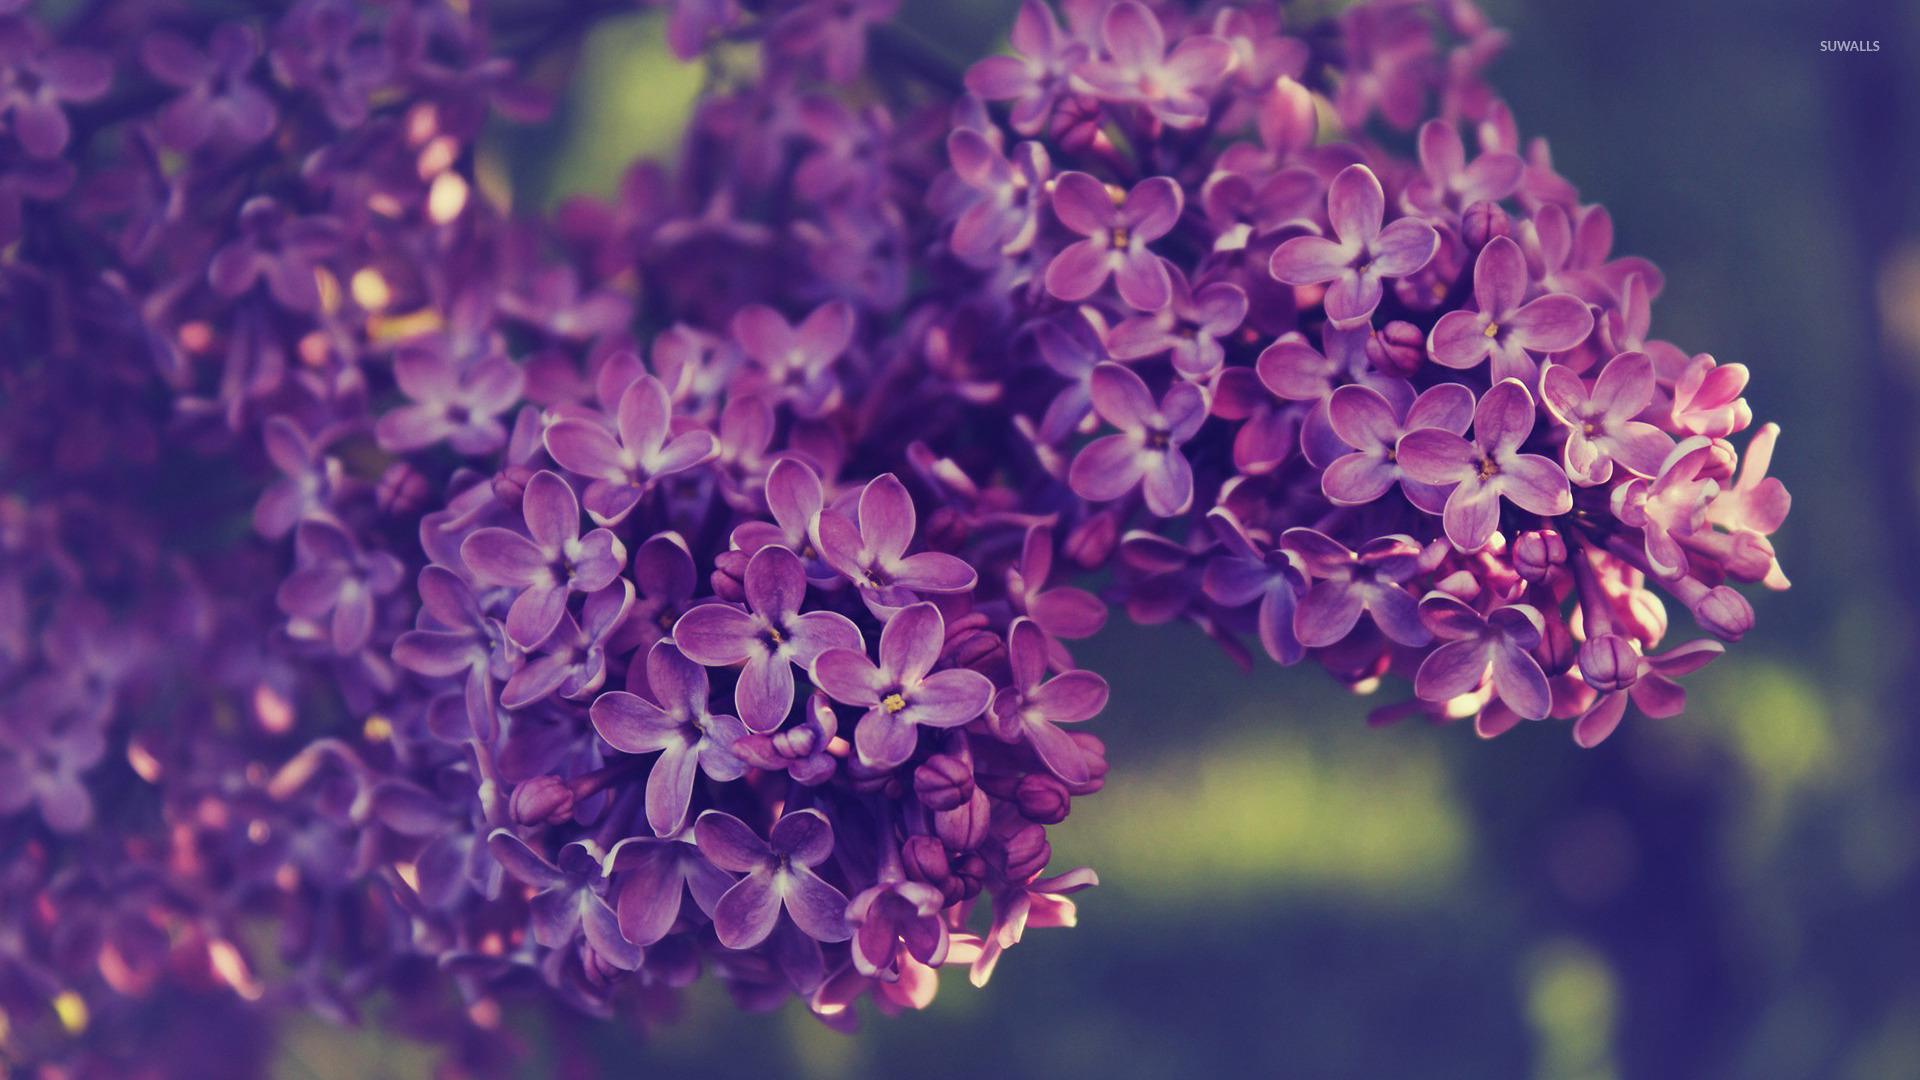 44+ Lilac Background Wallpaper on WallpaperSafari